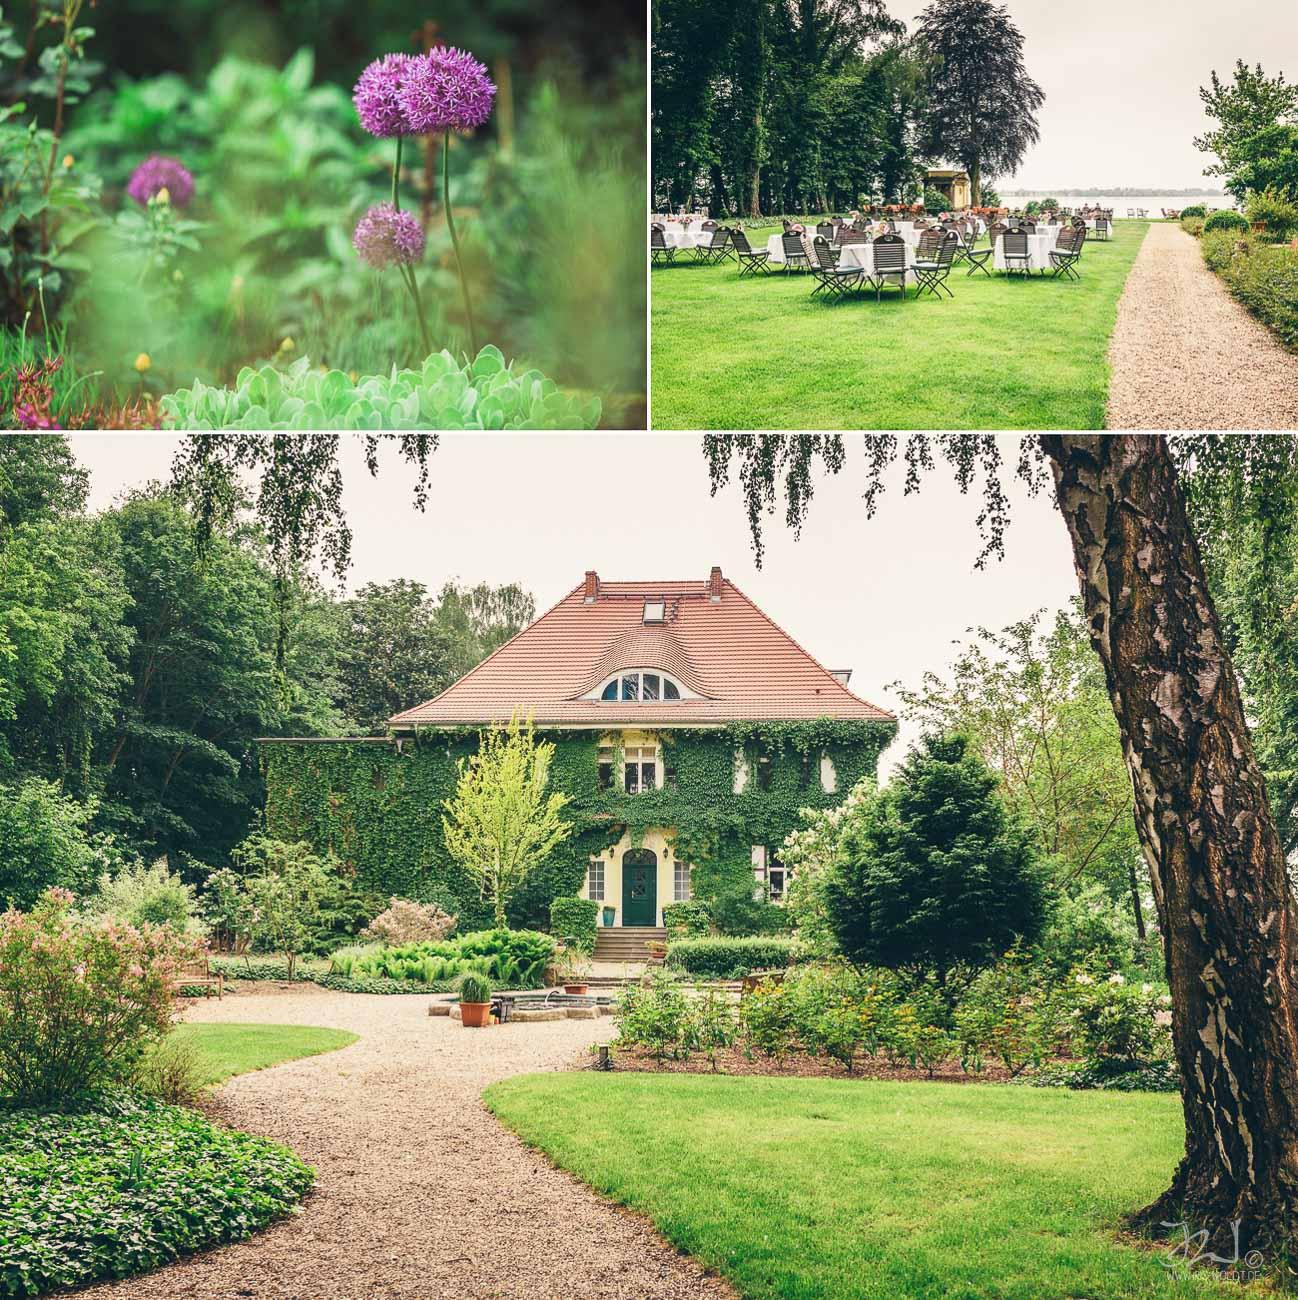 0025_Hochzeitsfotograf_Potsdam_Gut_Schloss_Golm_IrisWoldt26